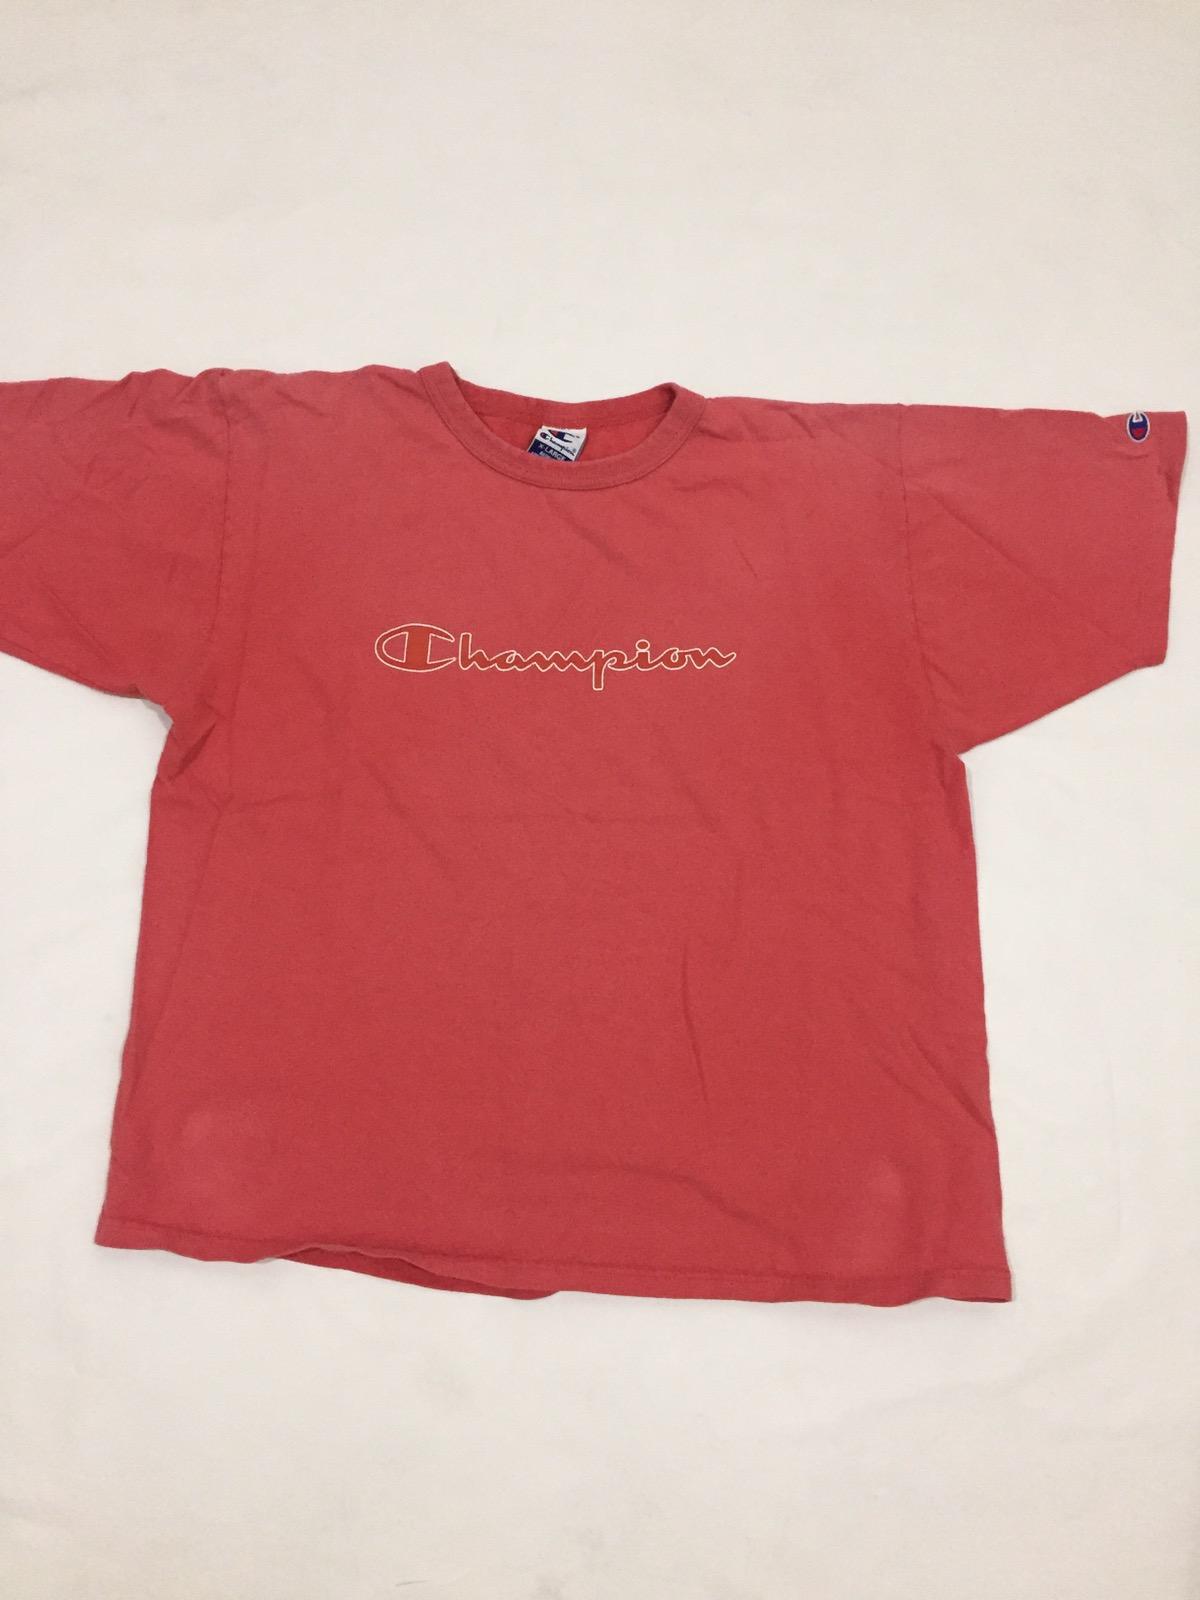 221ce30e Vintage × Champion × American Vintage ×. Vintage 90s champion script logo  tee. Size: US XL ...